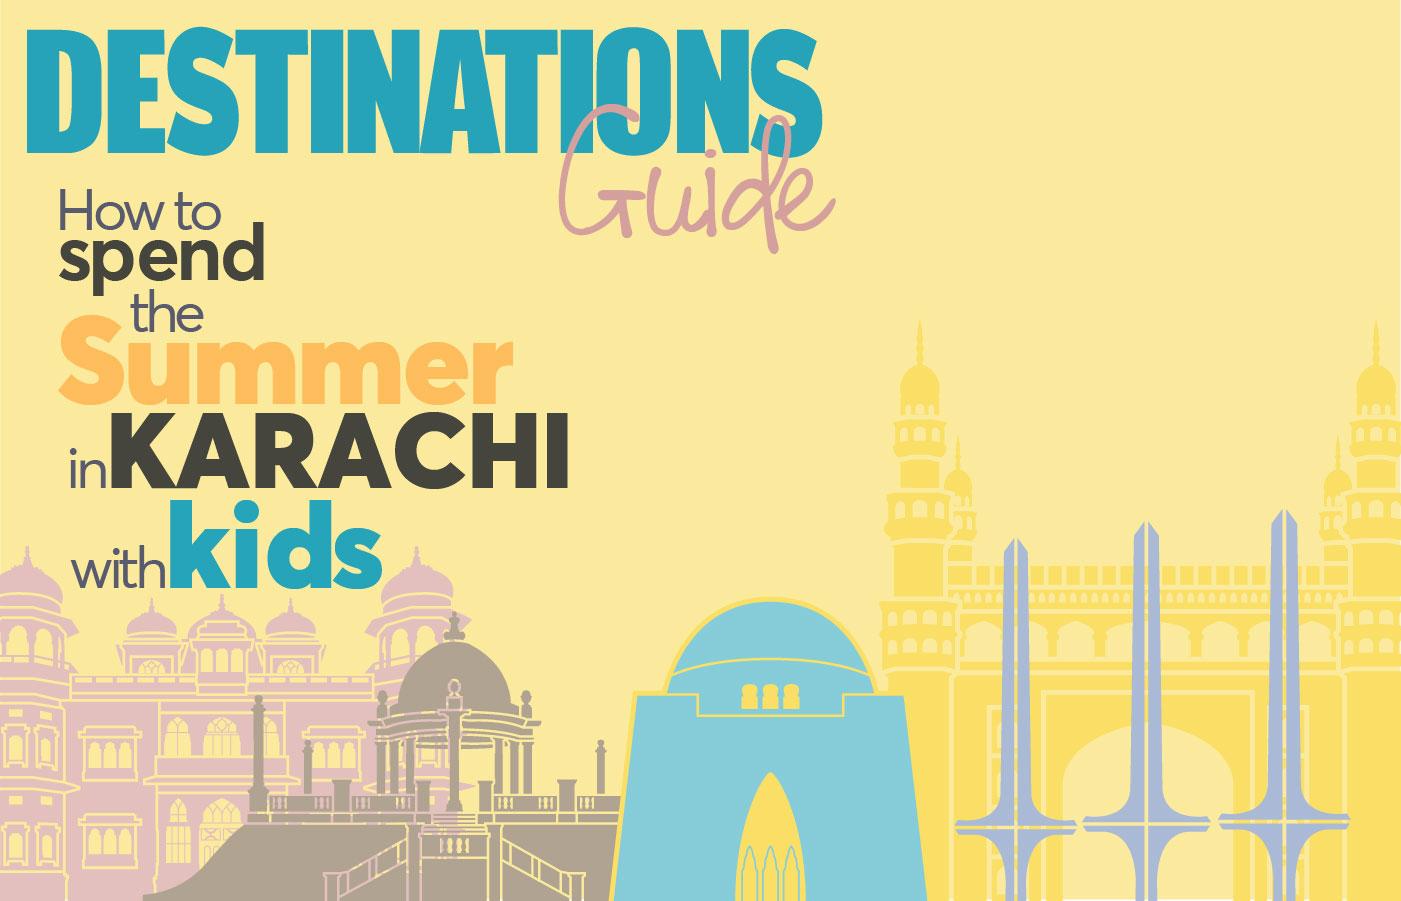 Karachi Guide - Destinations